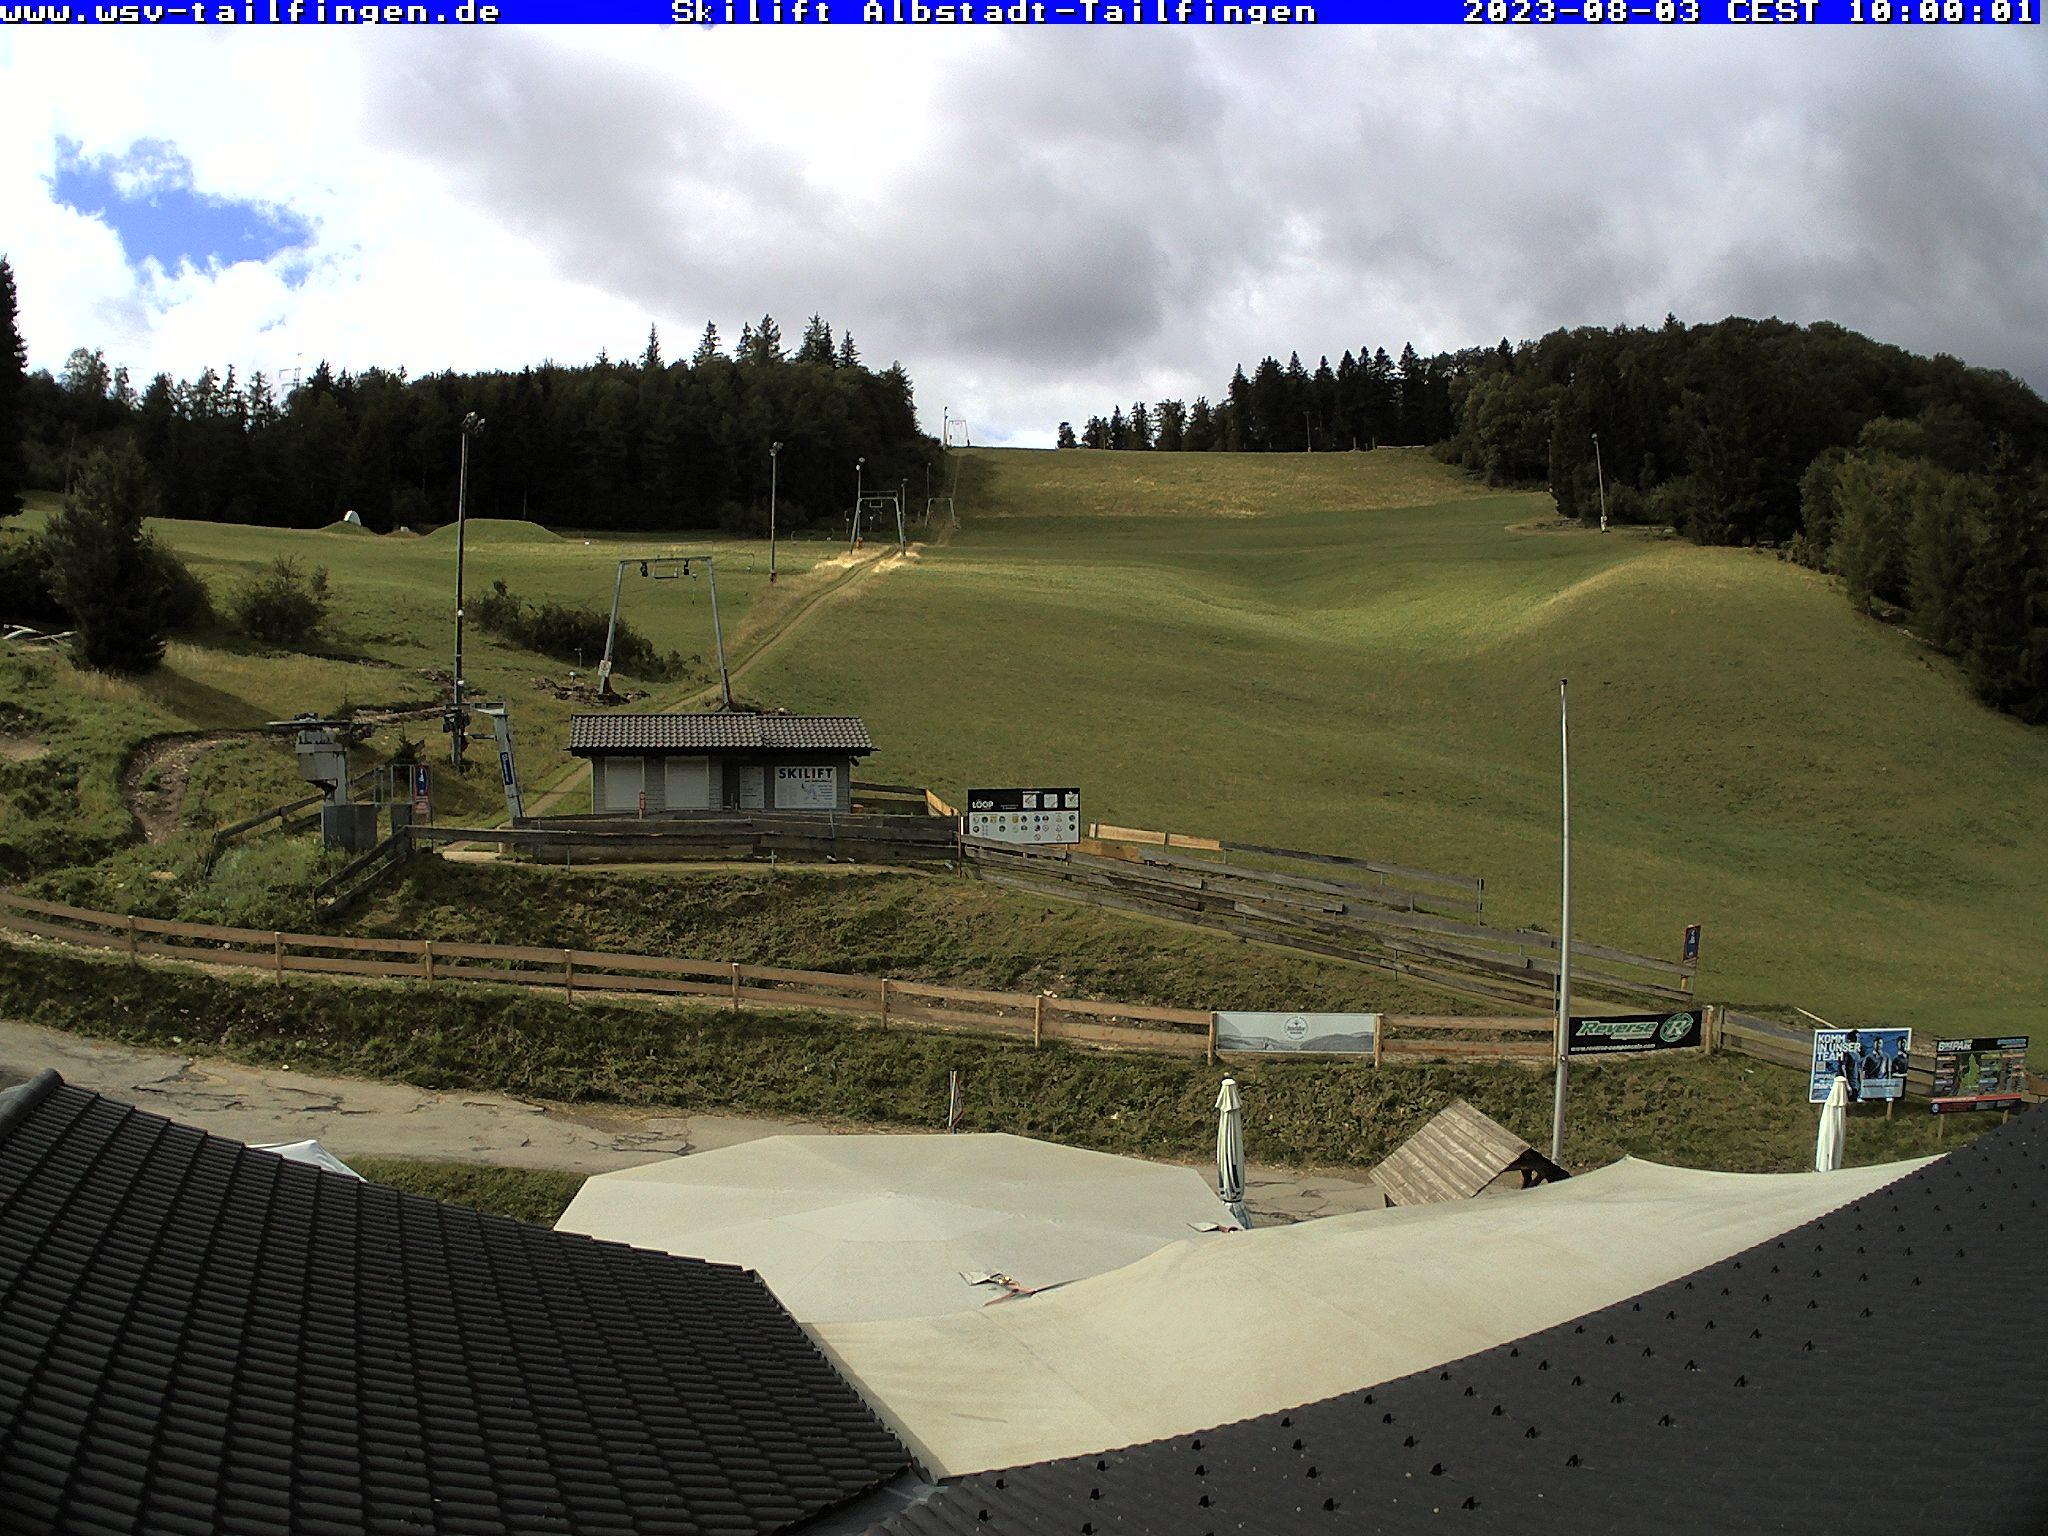 Webcam-Foto 10:00 Uhr / Skilift Albstadt-Tailfingen